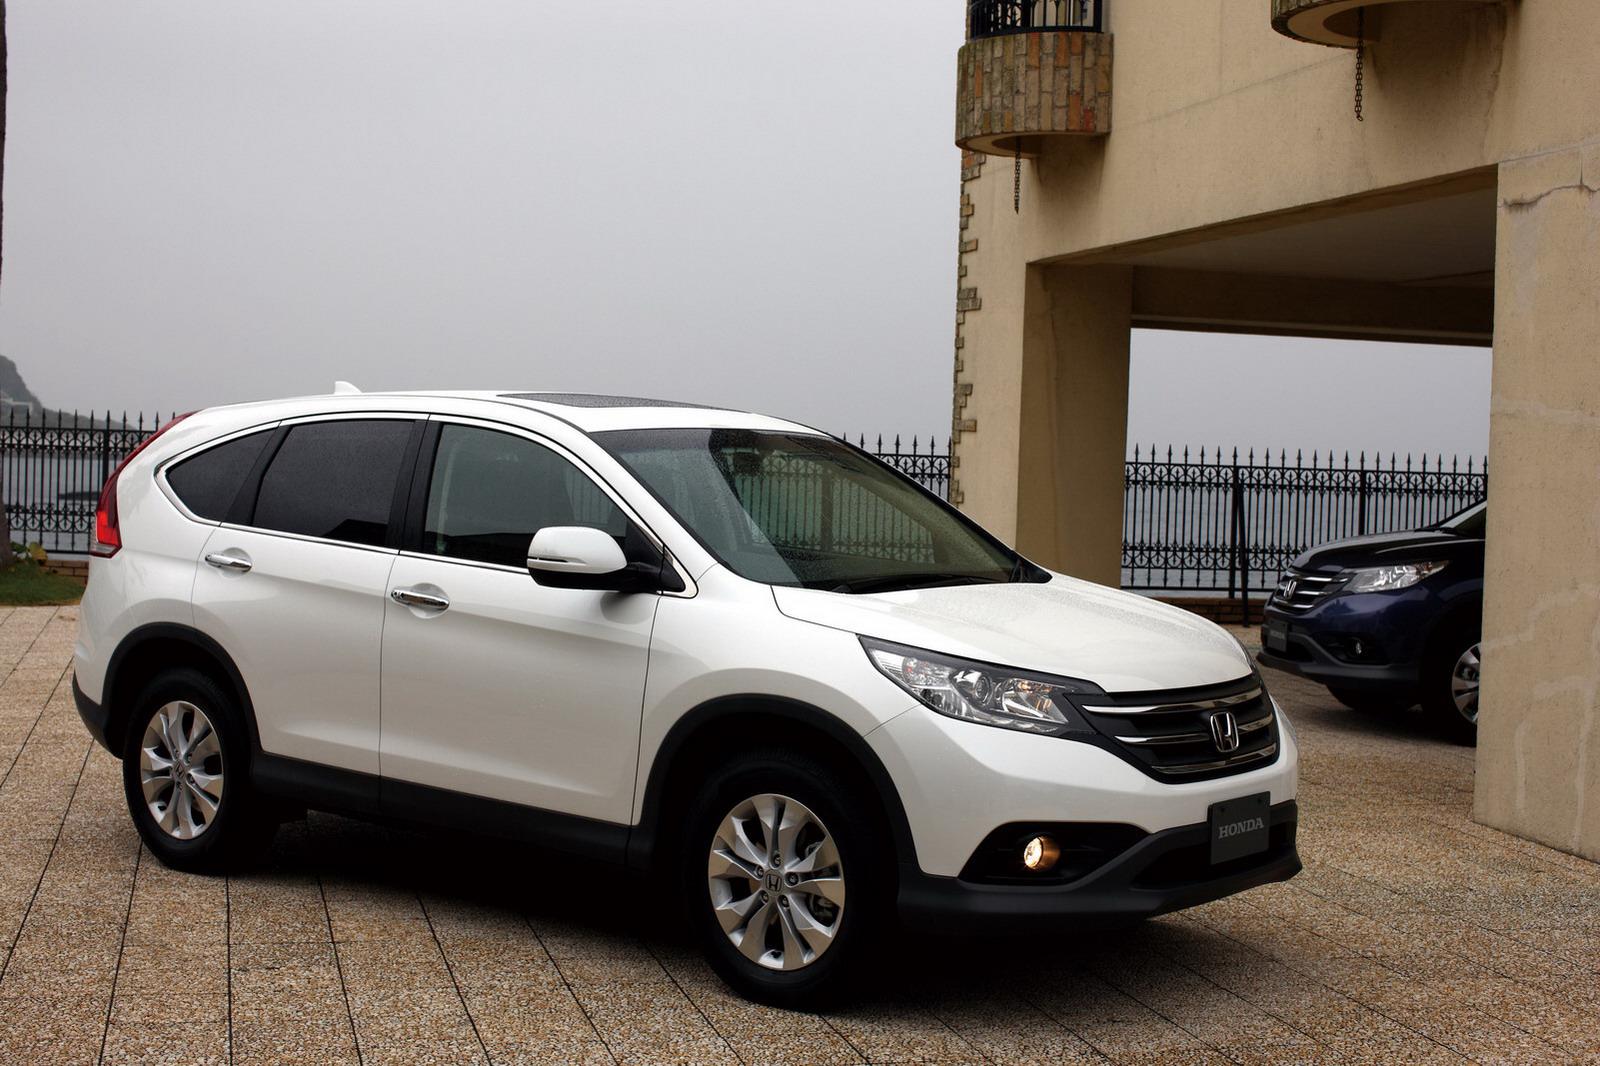 2012 Honda CRV Unveiled in Japan  autoevolution